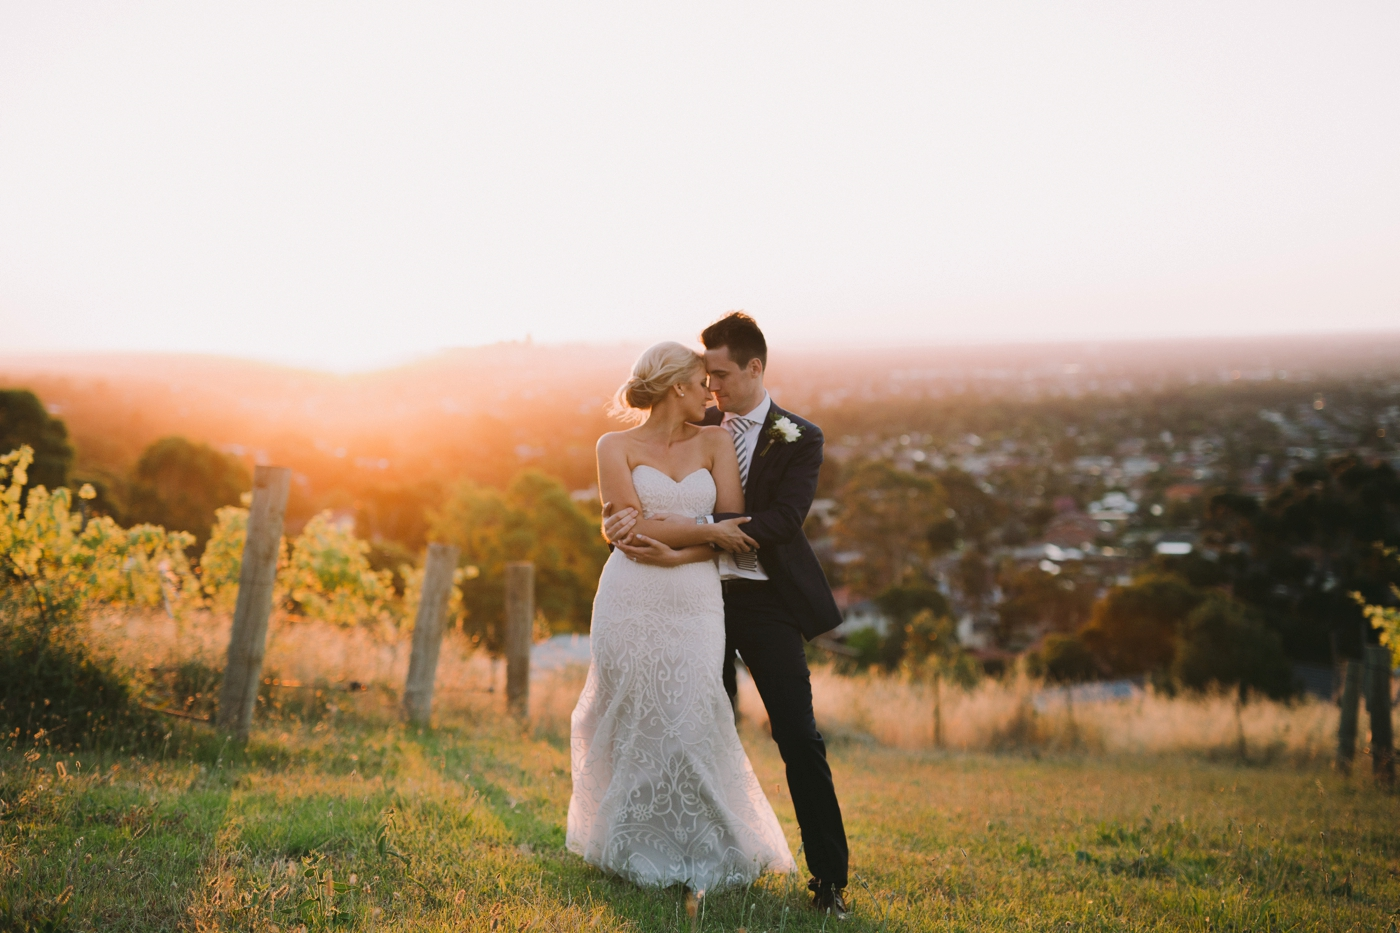 Lauren & Max - Marybank Estate Wedding - Natural wedding photographer in Adelaide - www.katherineschultzphotography.com 115